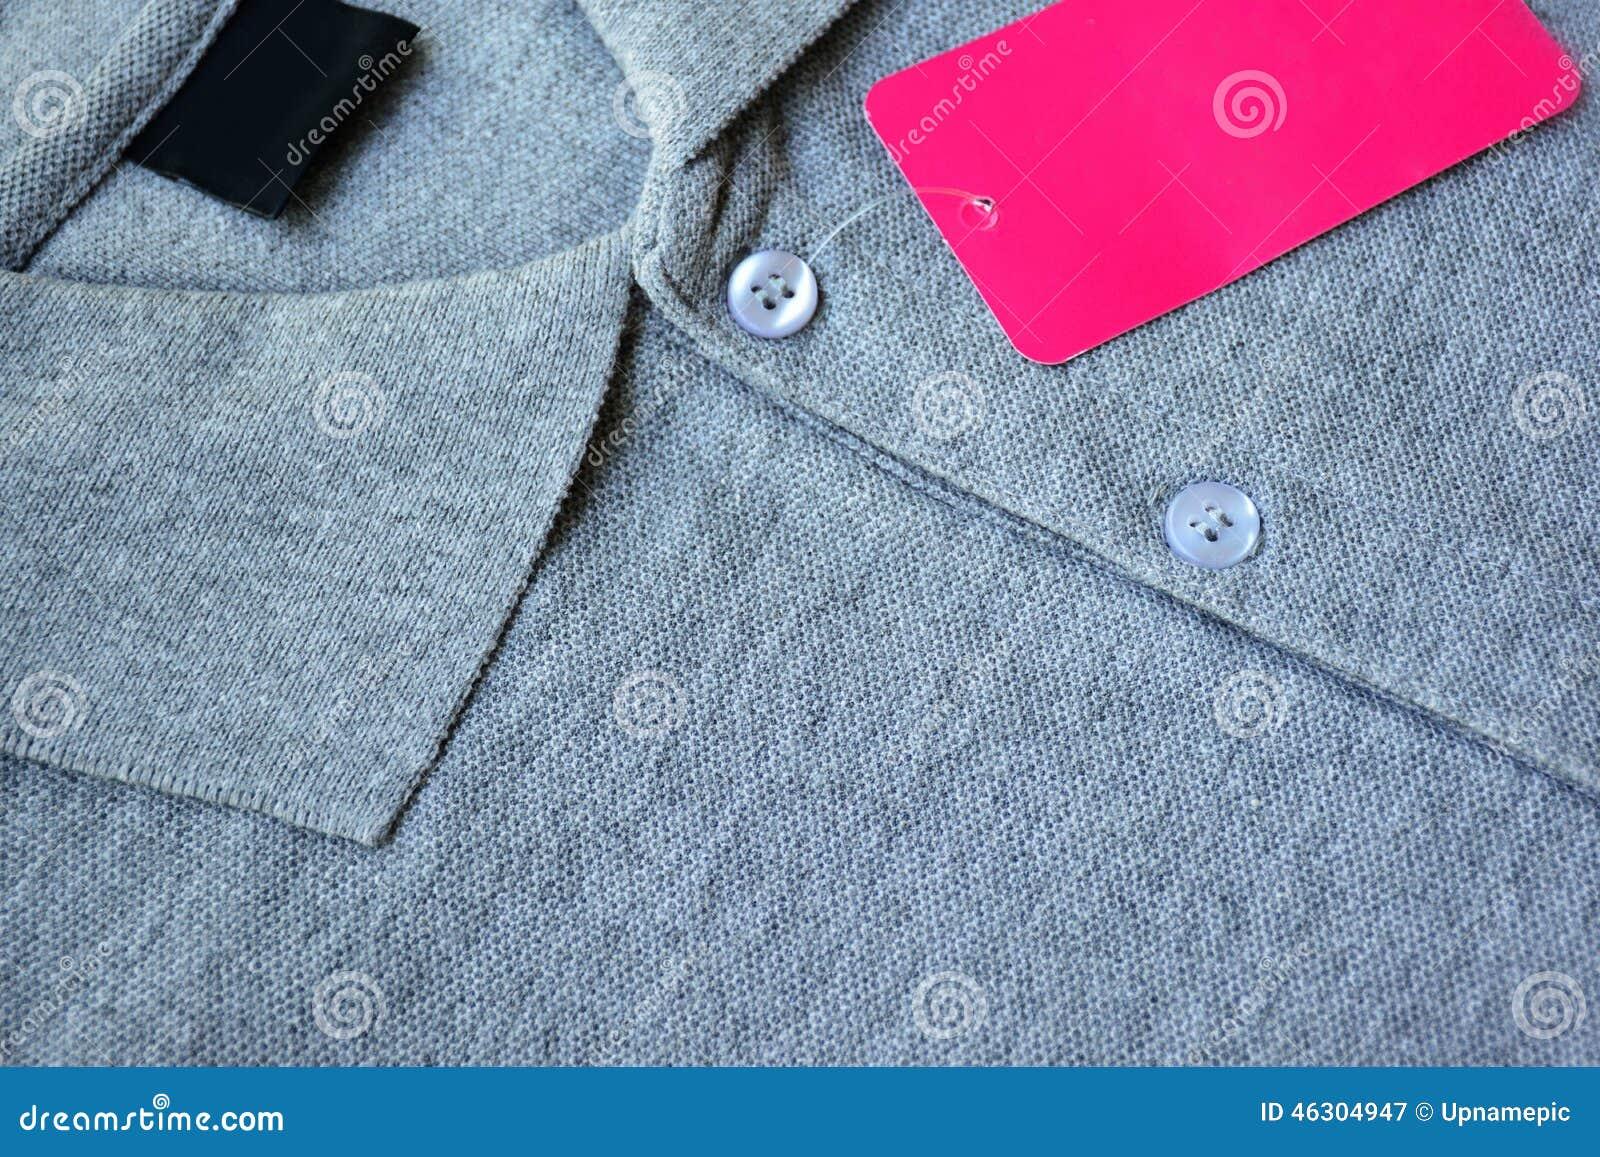 2c055e2d1511 Γκρίζα μπλούζα πόλο και κενή ετικέτα Στοκ Εικόνα - εικόνα από ...